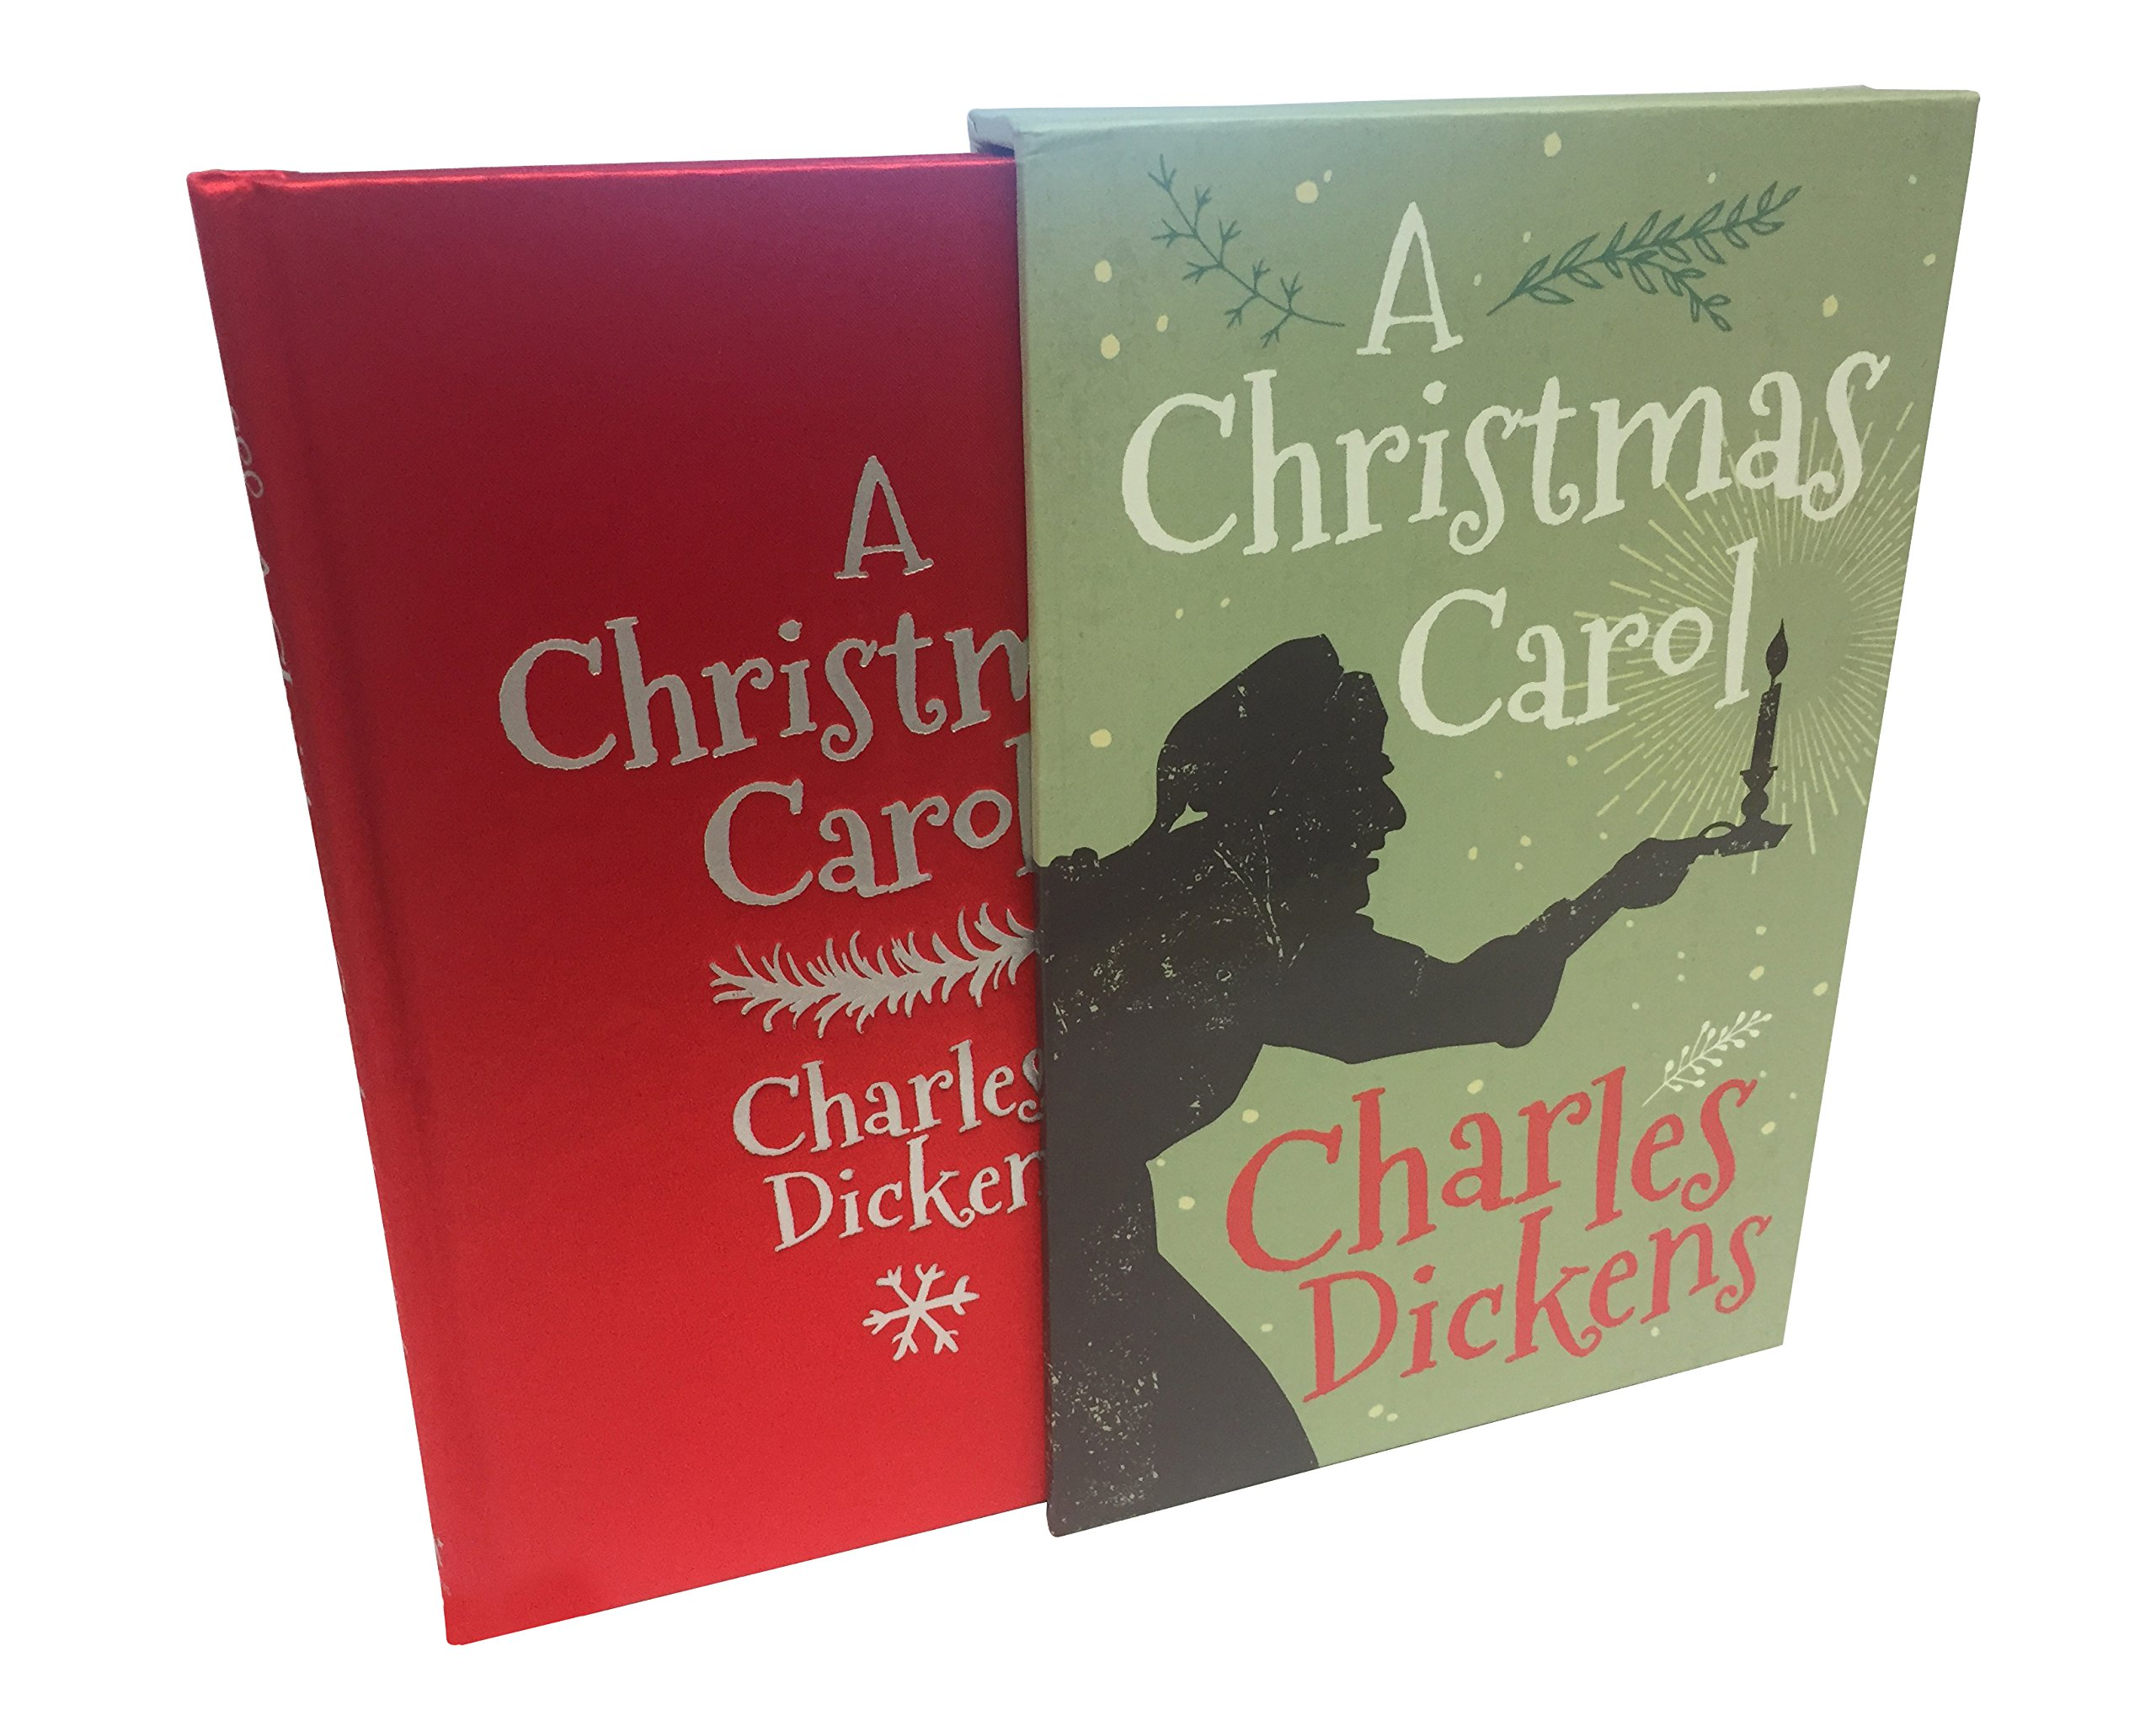 A Christmas Carol Book Cover.A Christmas Carol Slip Case Edition Charles Dickens